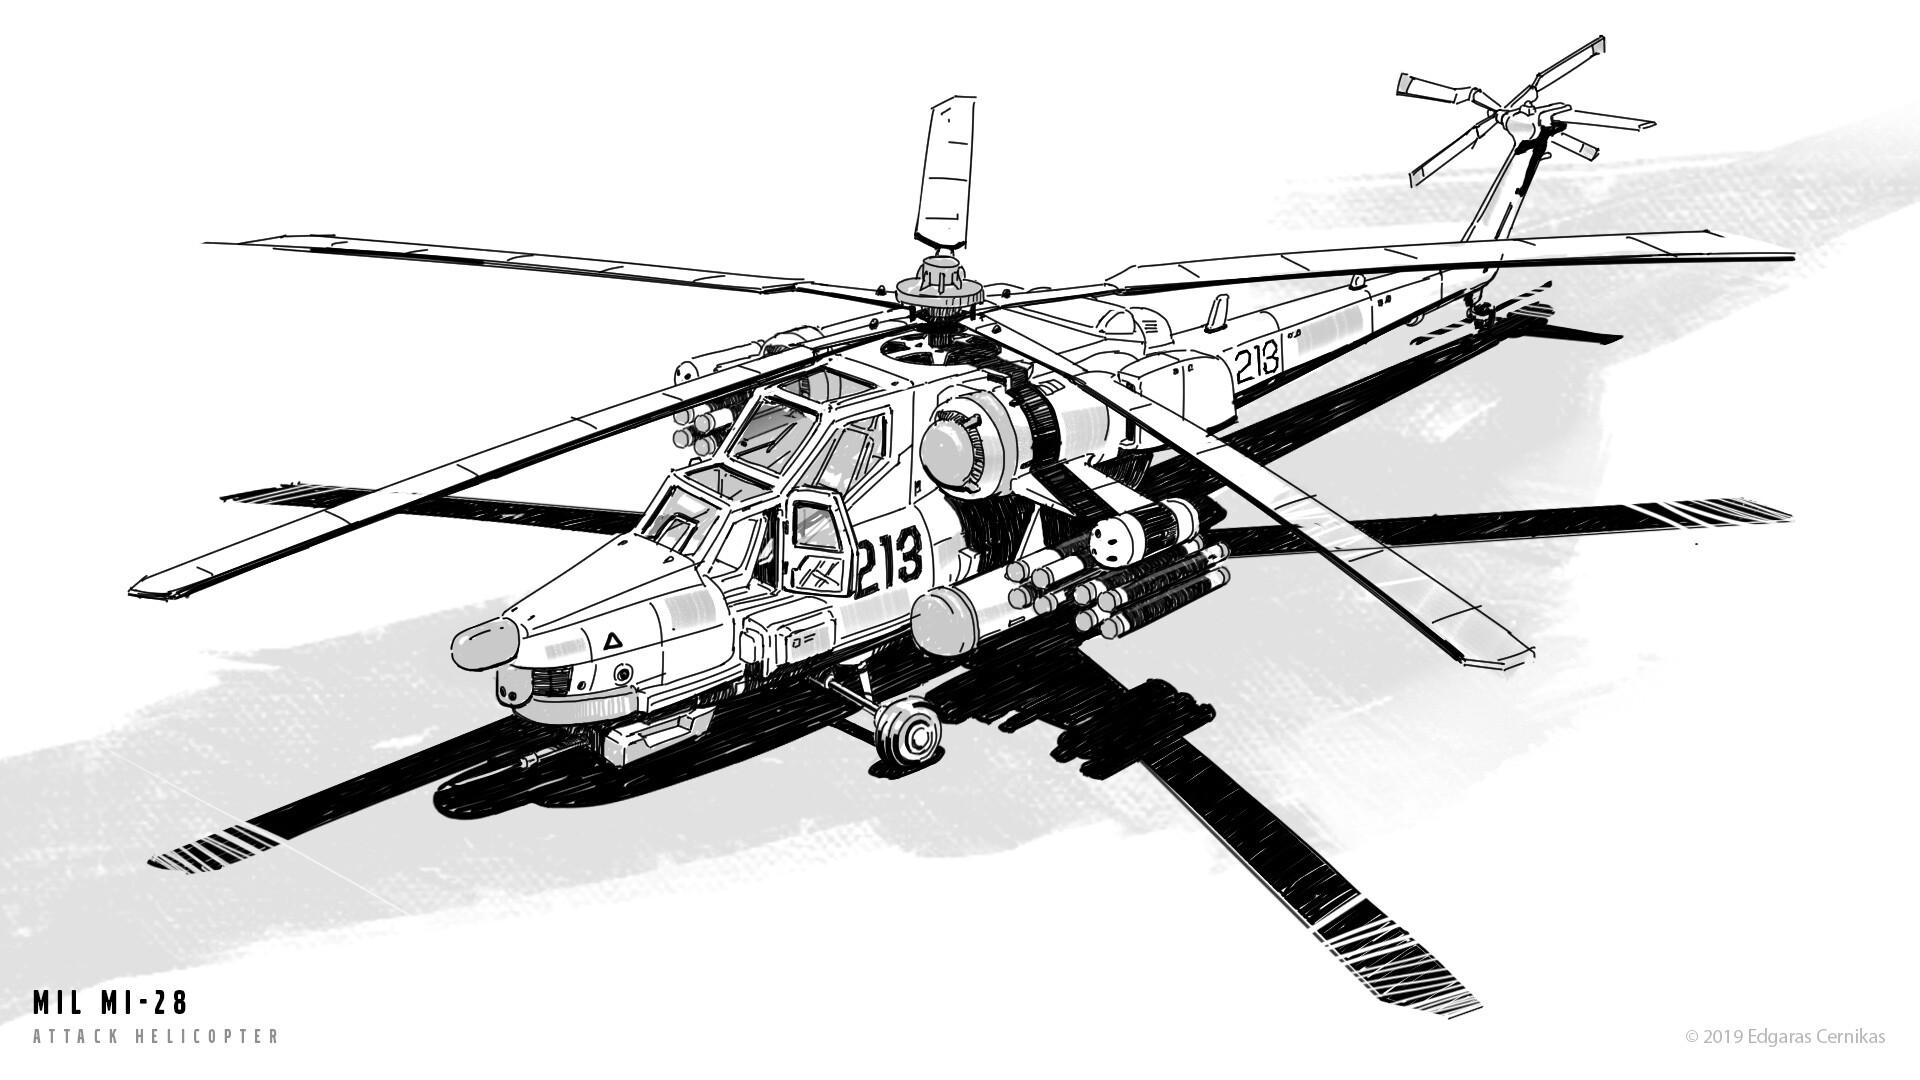 Edgaras cernikas mi 28 helicopter final 1920x1080 v1